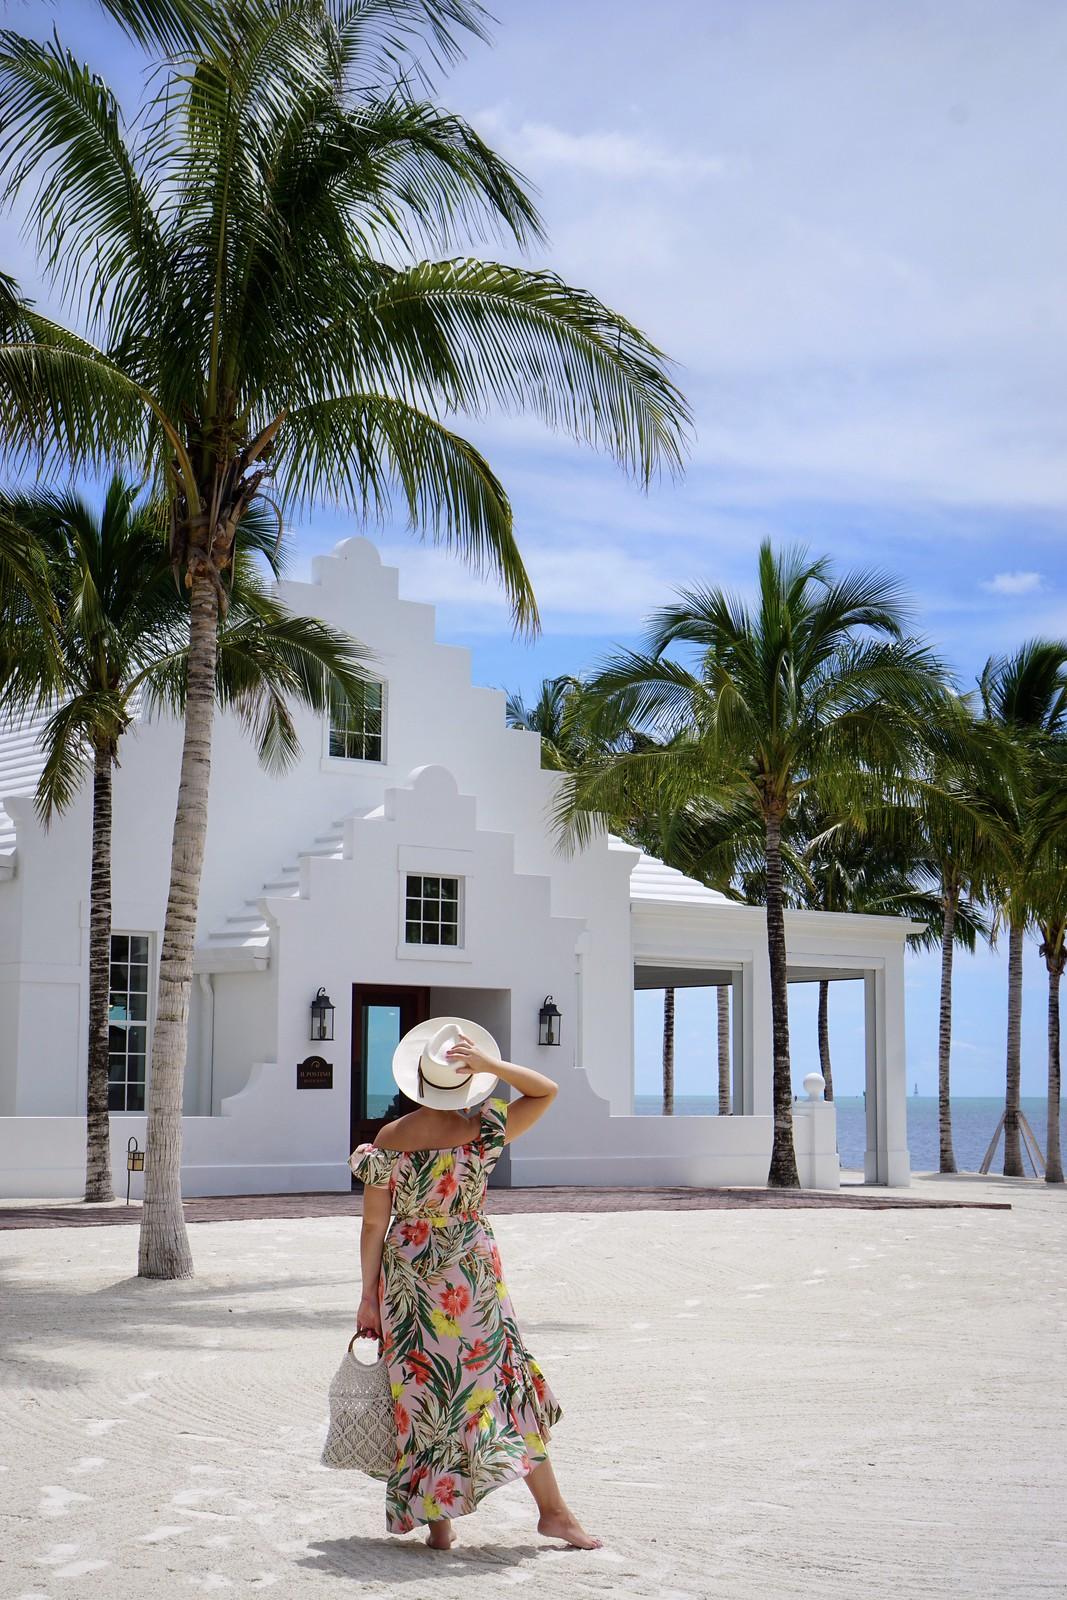 isla-bella-beach-resort-ultimate-road-trip-5-days-florida-keys-itinerary-what-to-do-key-west-key-largo-islamorada-marathon-miami-vacation-guide